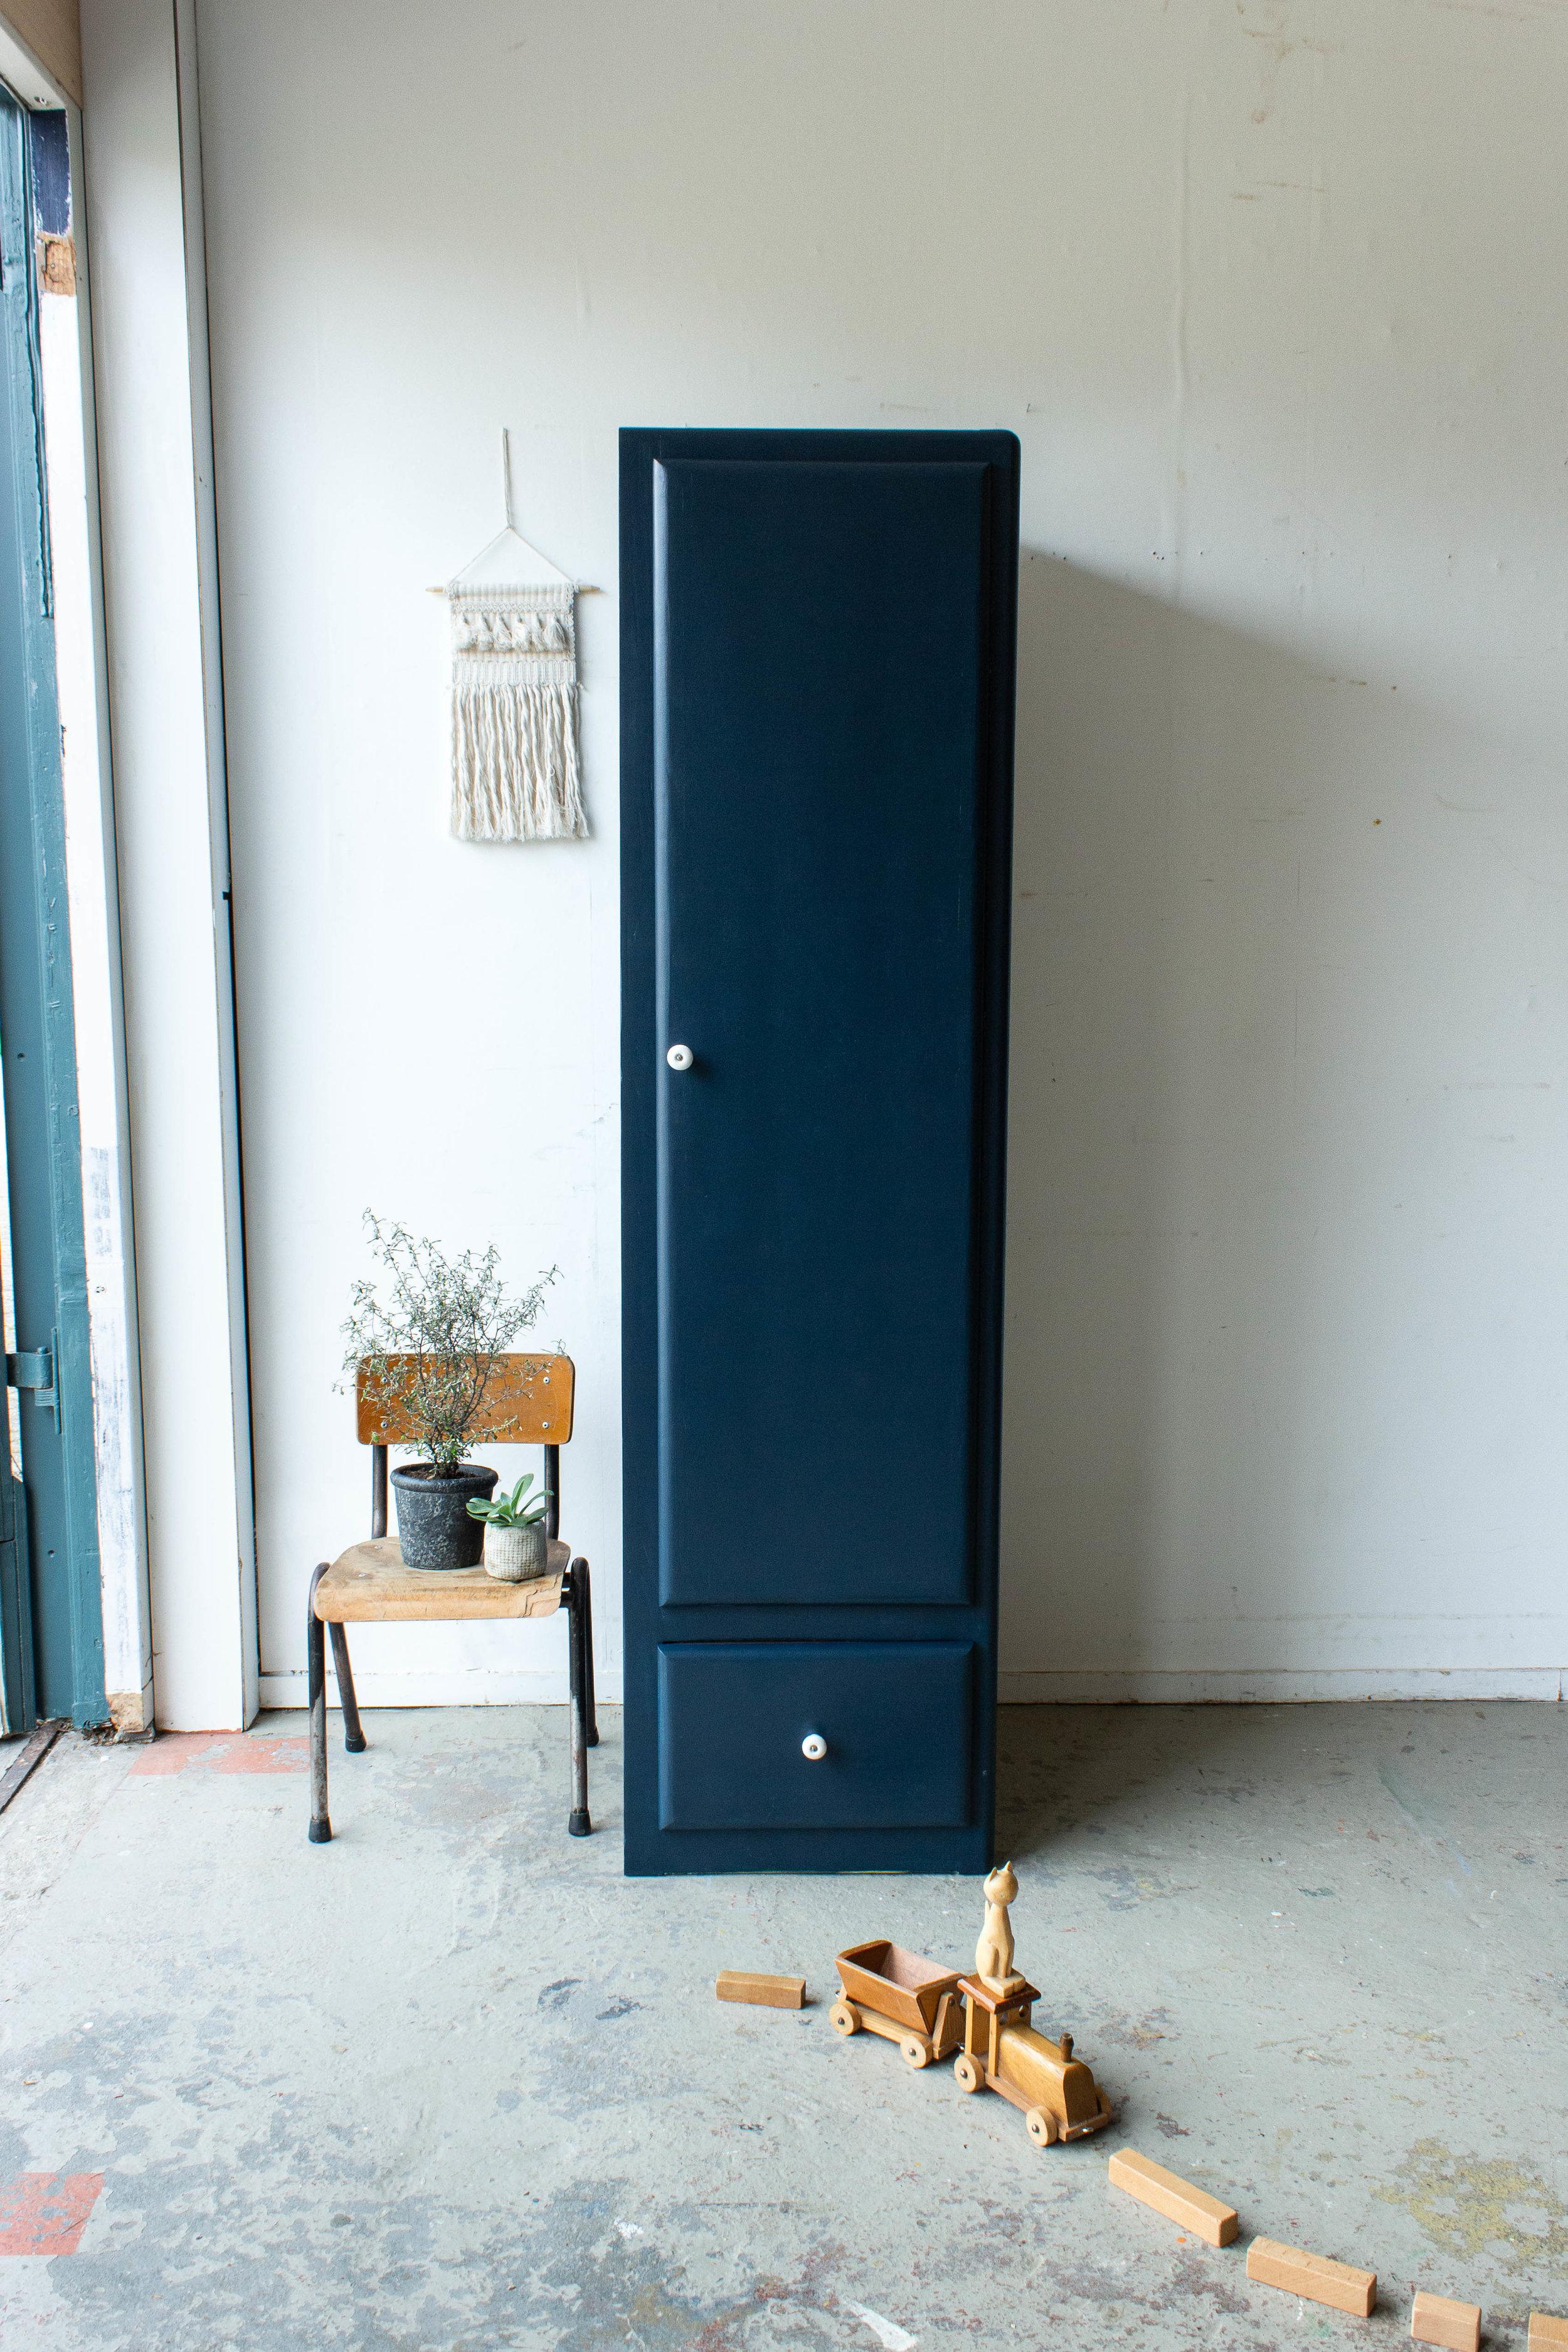 1456 - Nachtblauwe smalle keukenkast.jpg